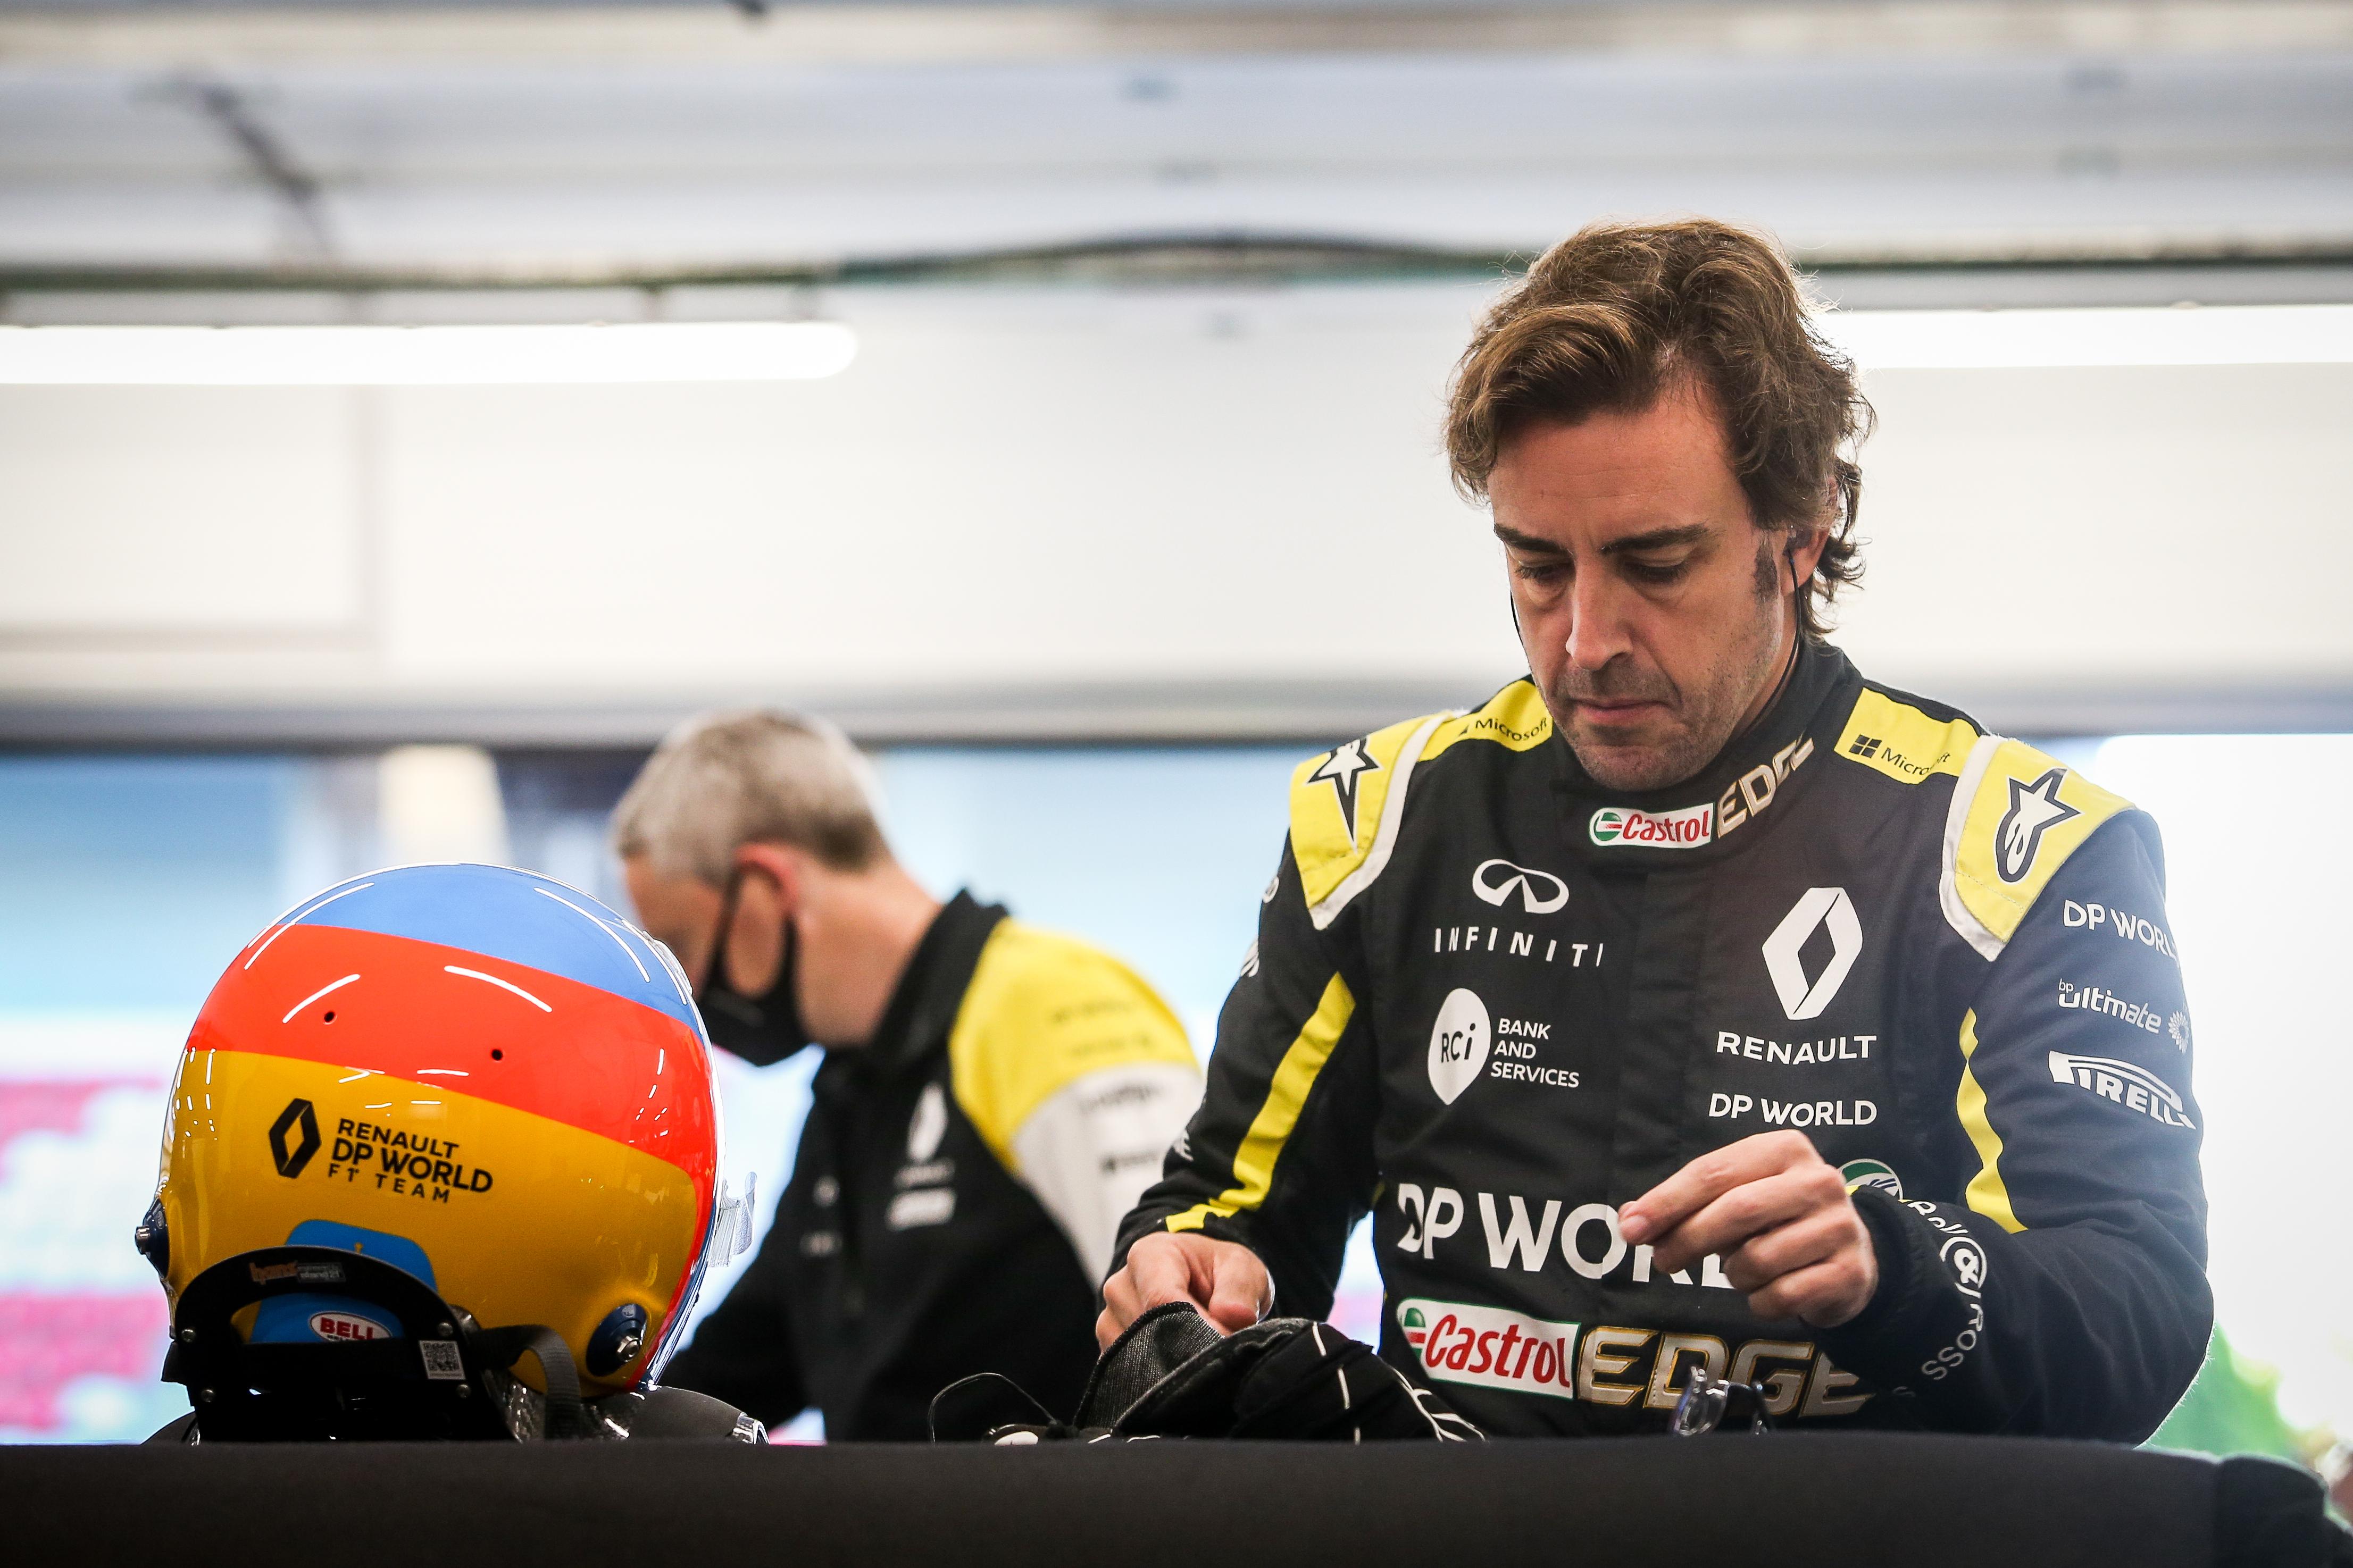 2020-10-13_Fernando Alonso_1_Renault Sport F1Media